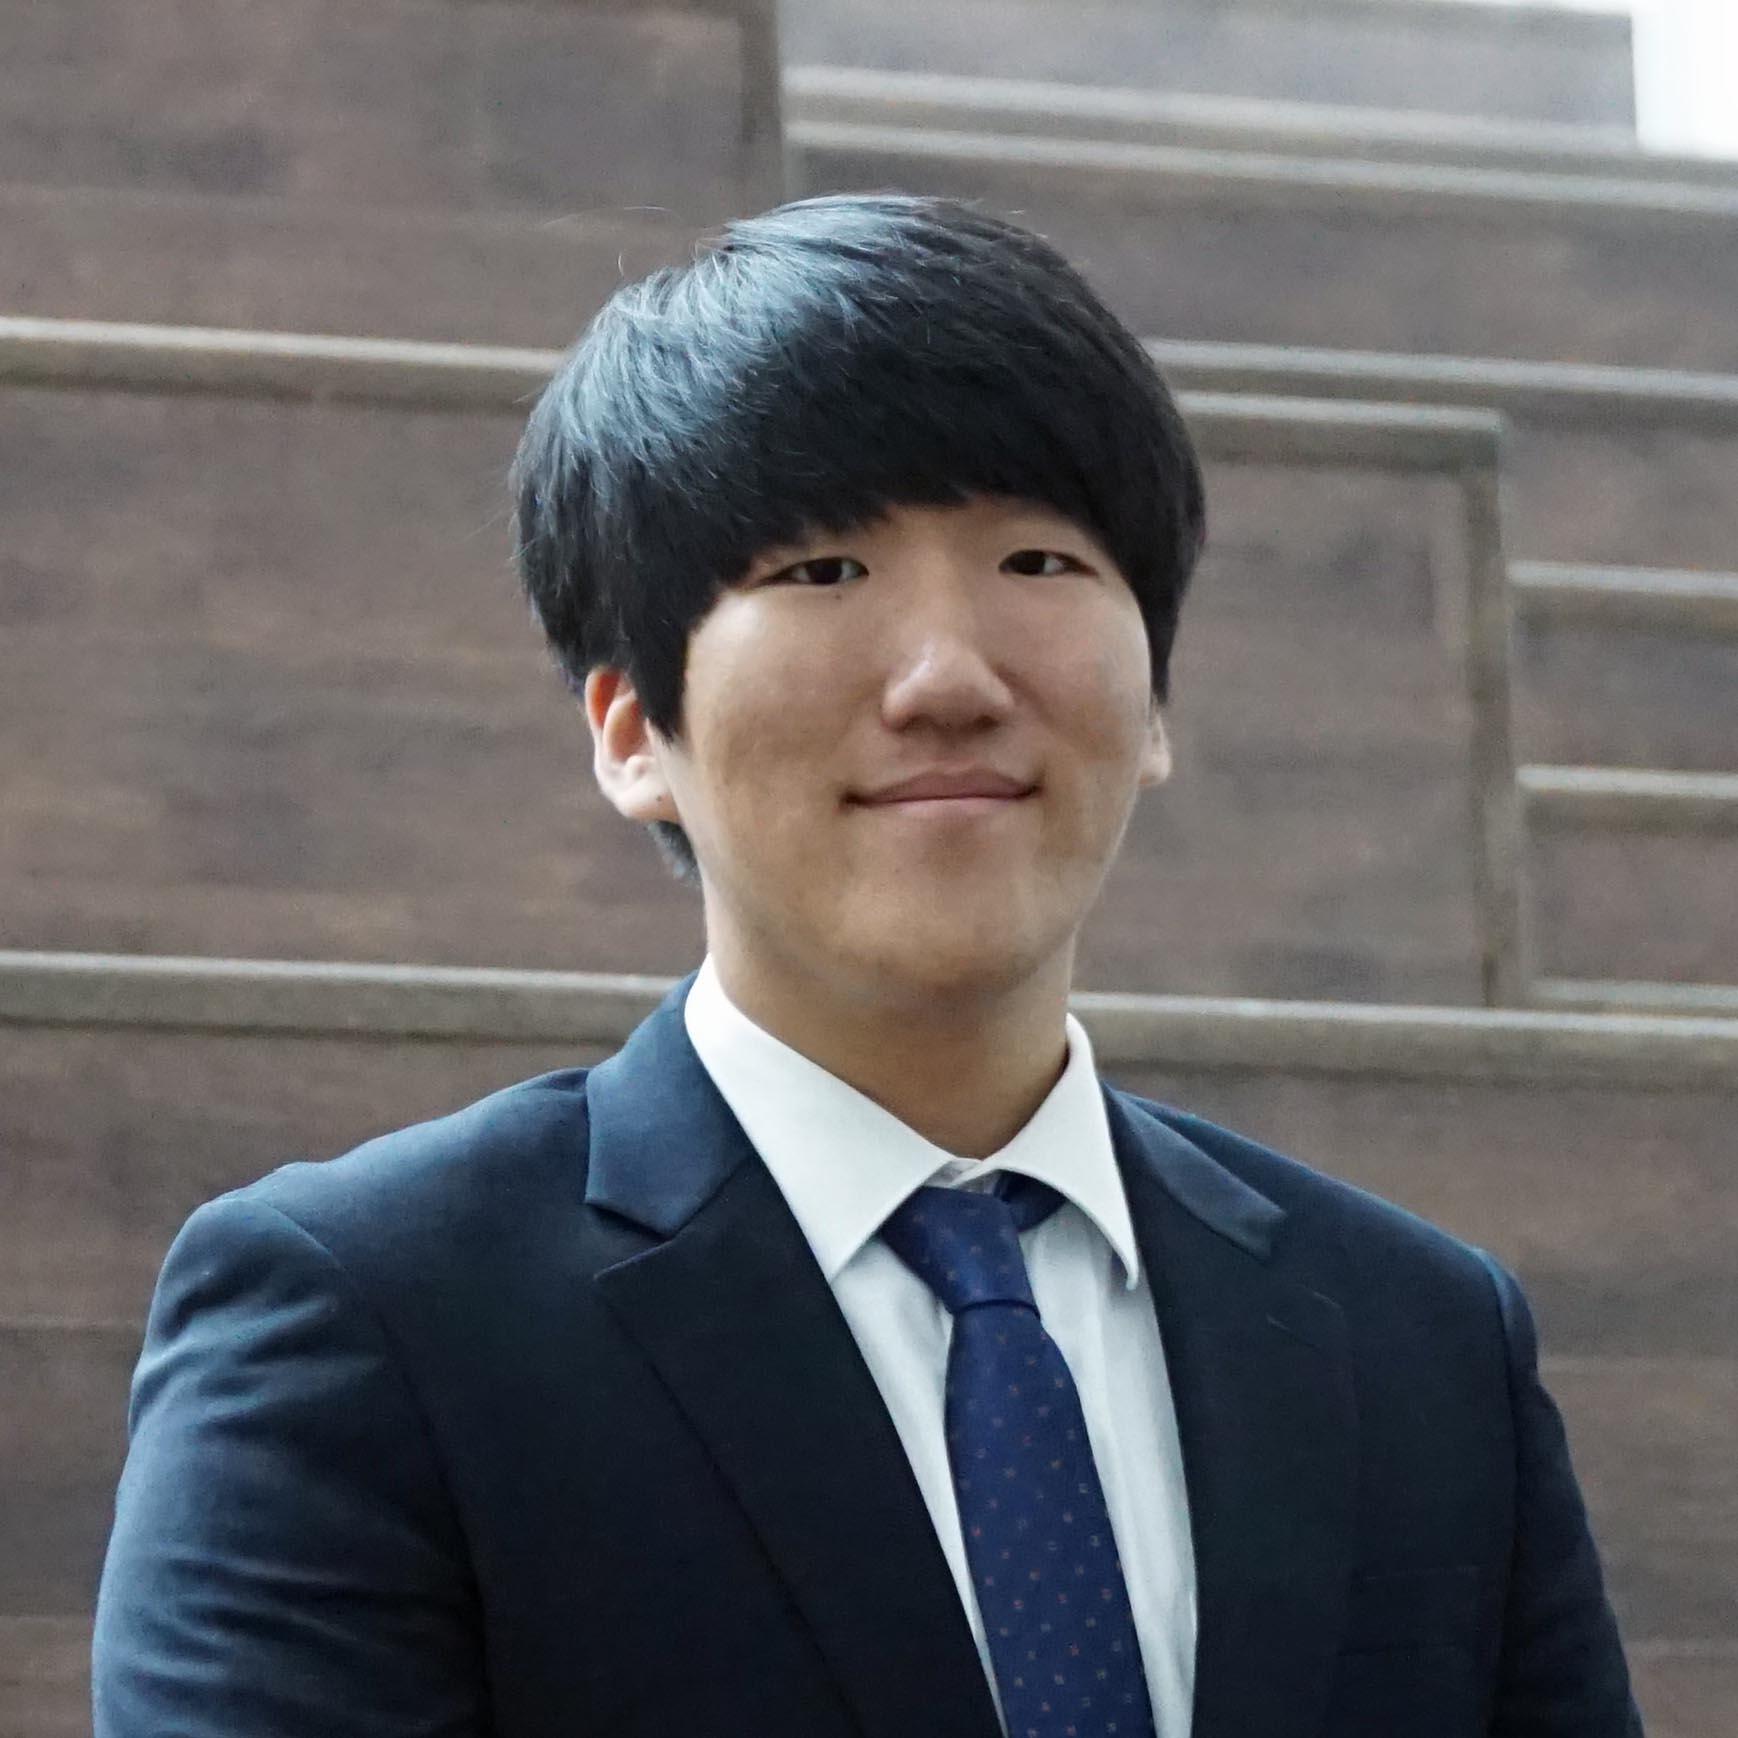 Jeong Hyun Lee